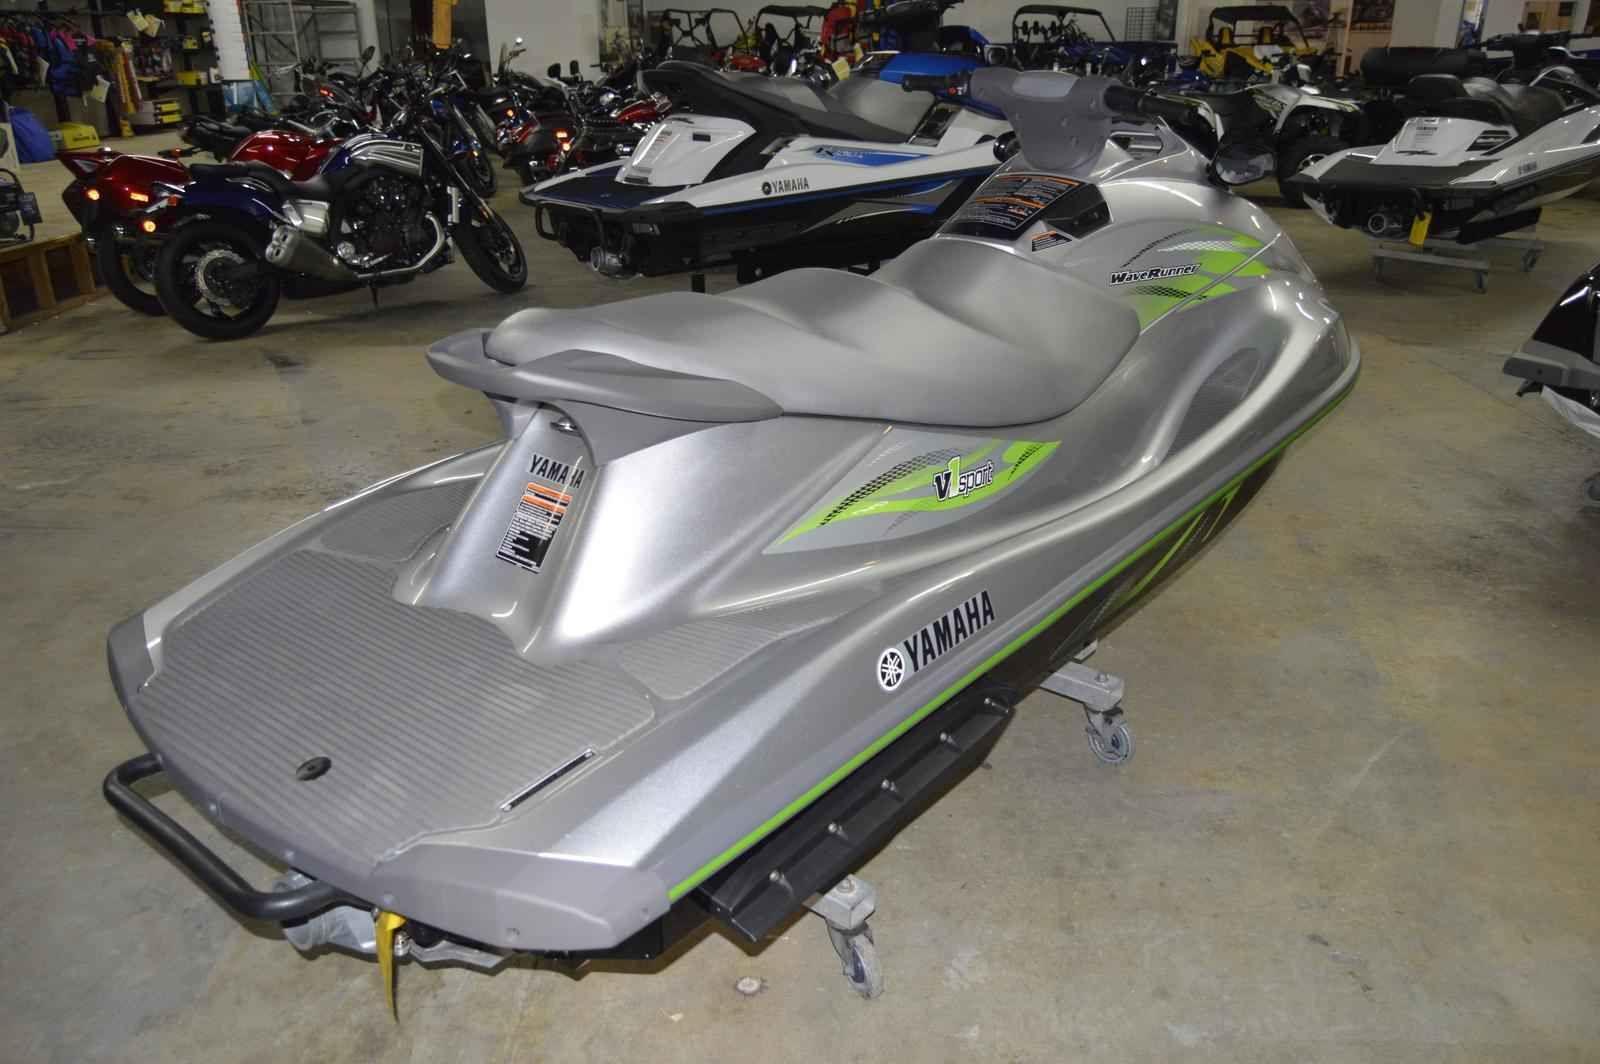 New 2016 Yamaha V1 Sport Jet Skis For Sale In Florida Fl 2016 Yamaha V1 Sport Skis For Sale Jet Ski Yamaha Jetski